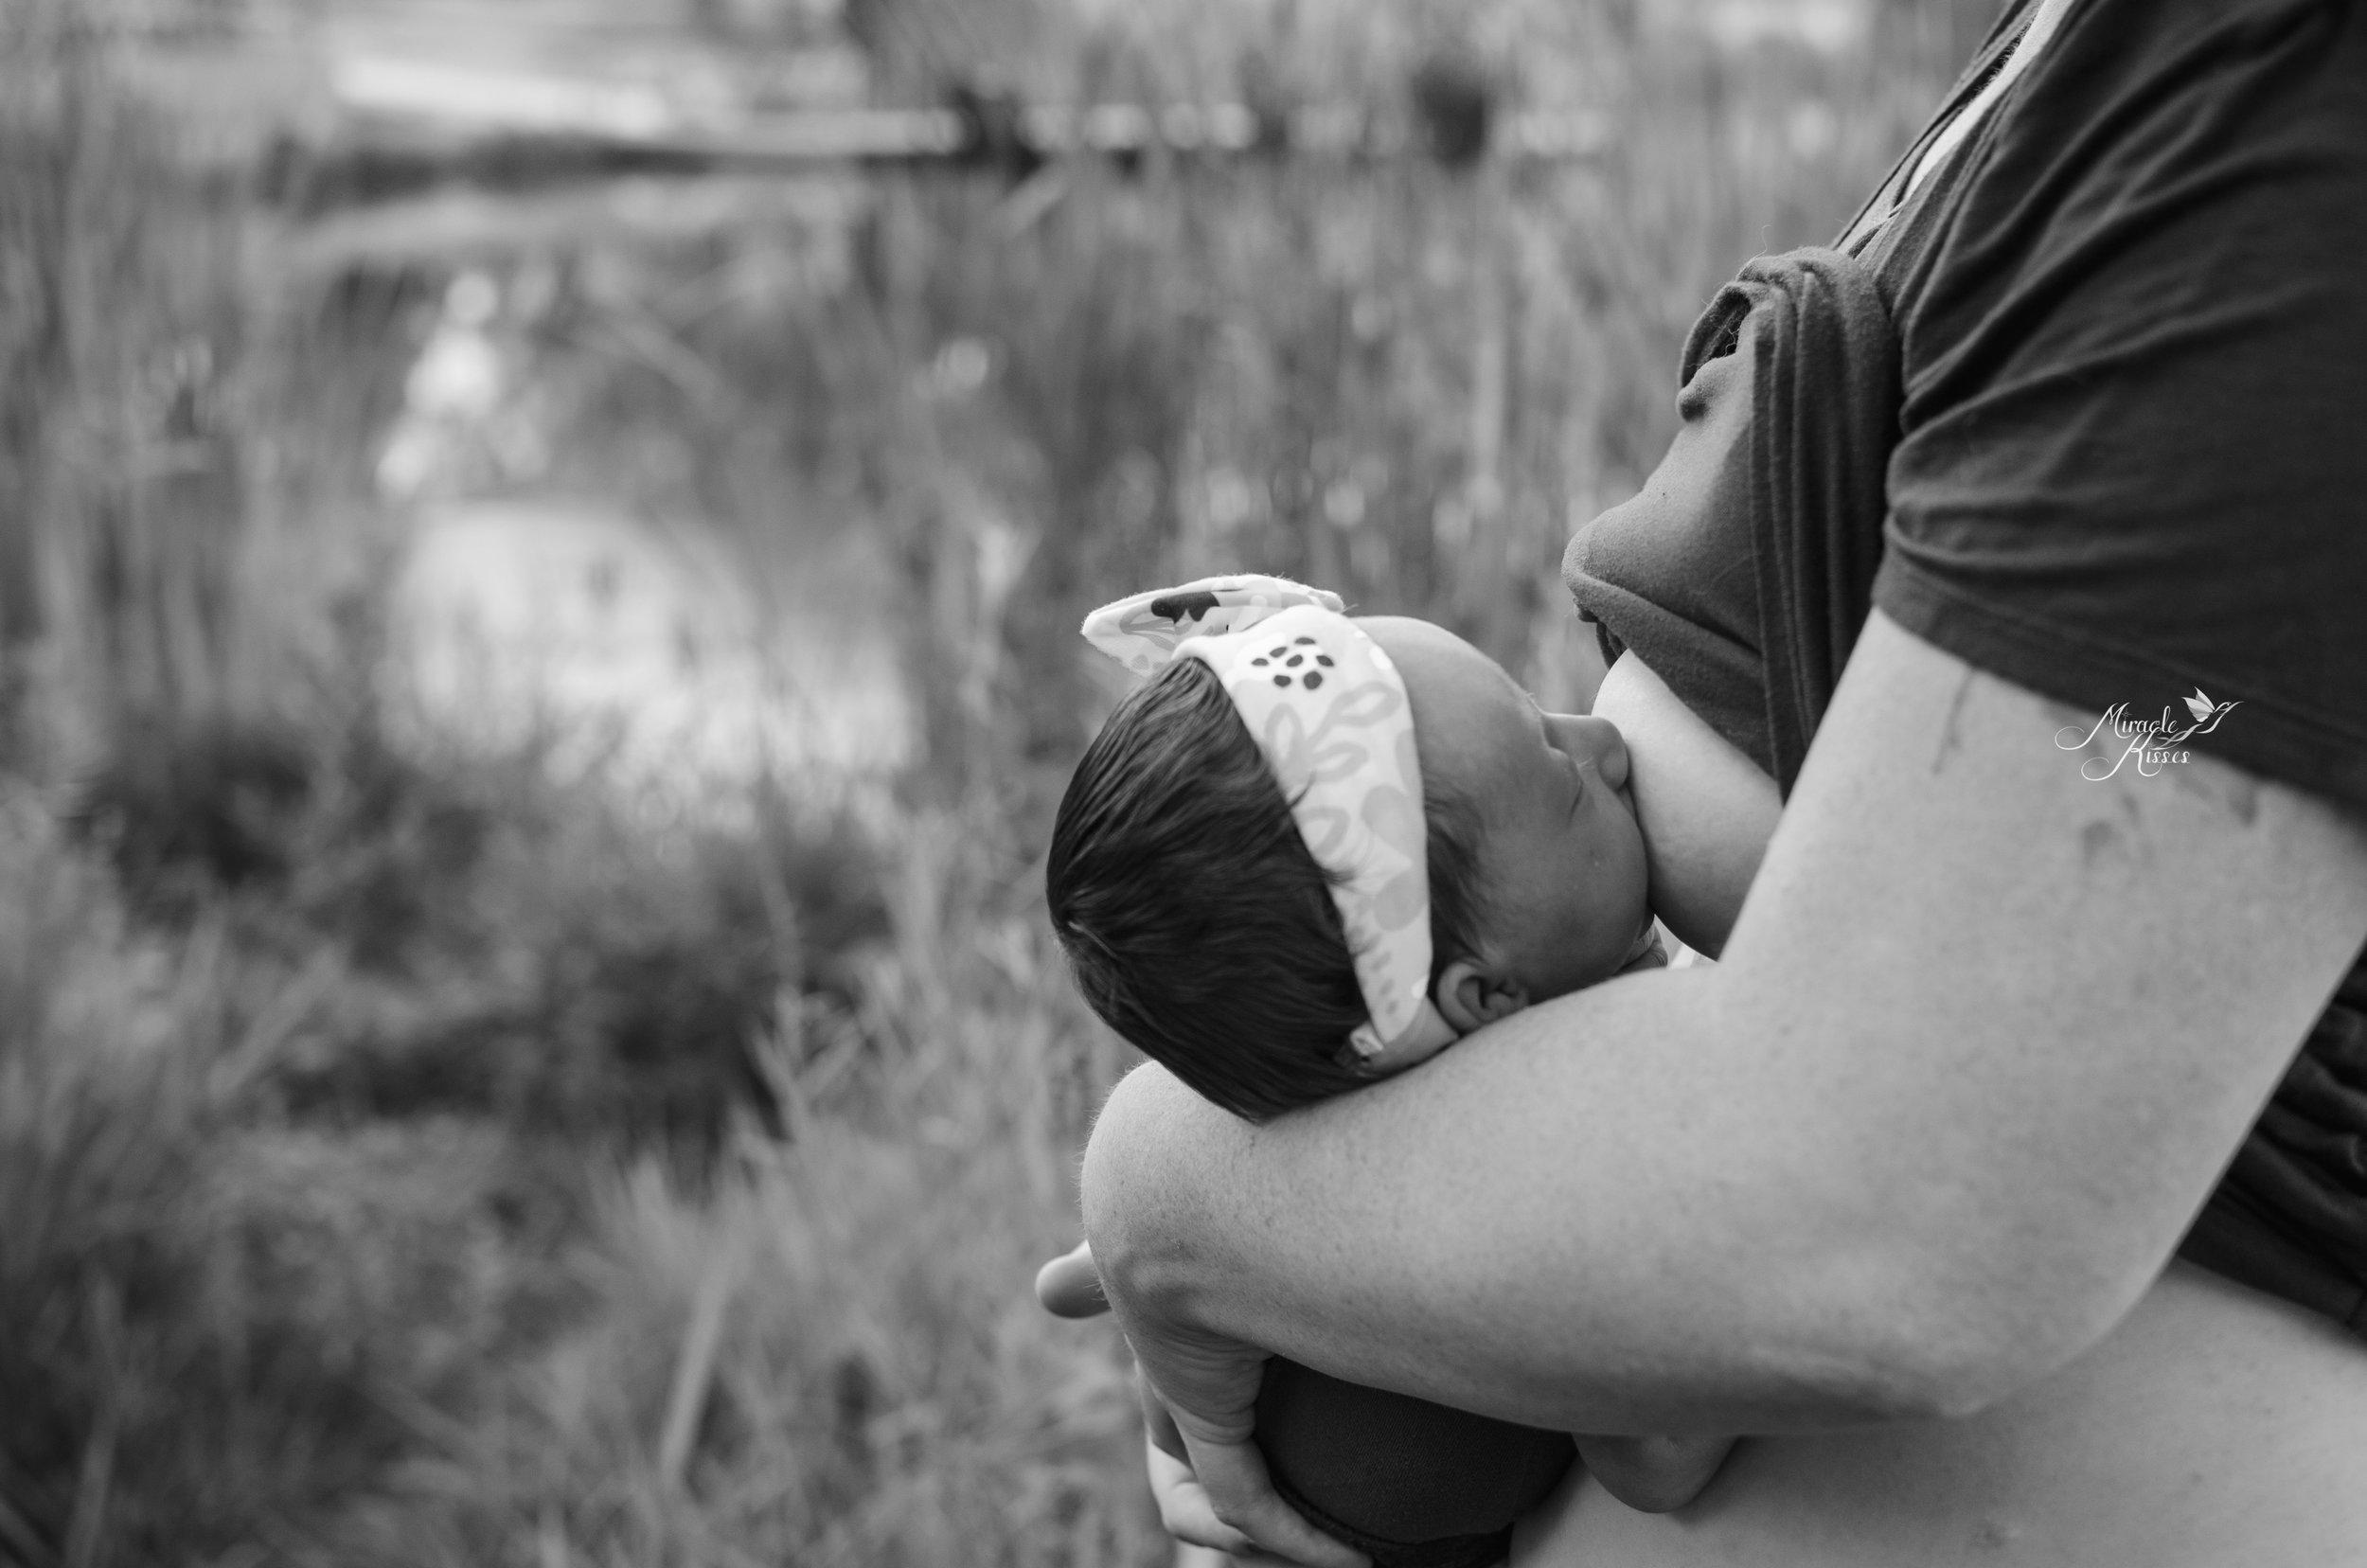 breastfeeding newborn, nursing outdoors, 31 days 31 stories